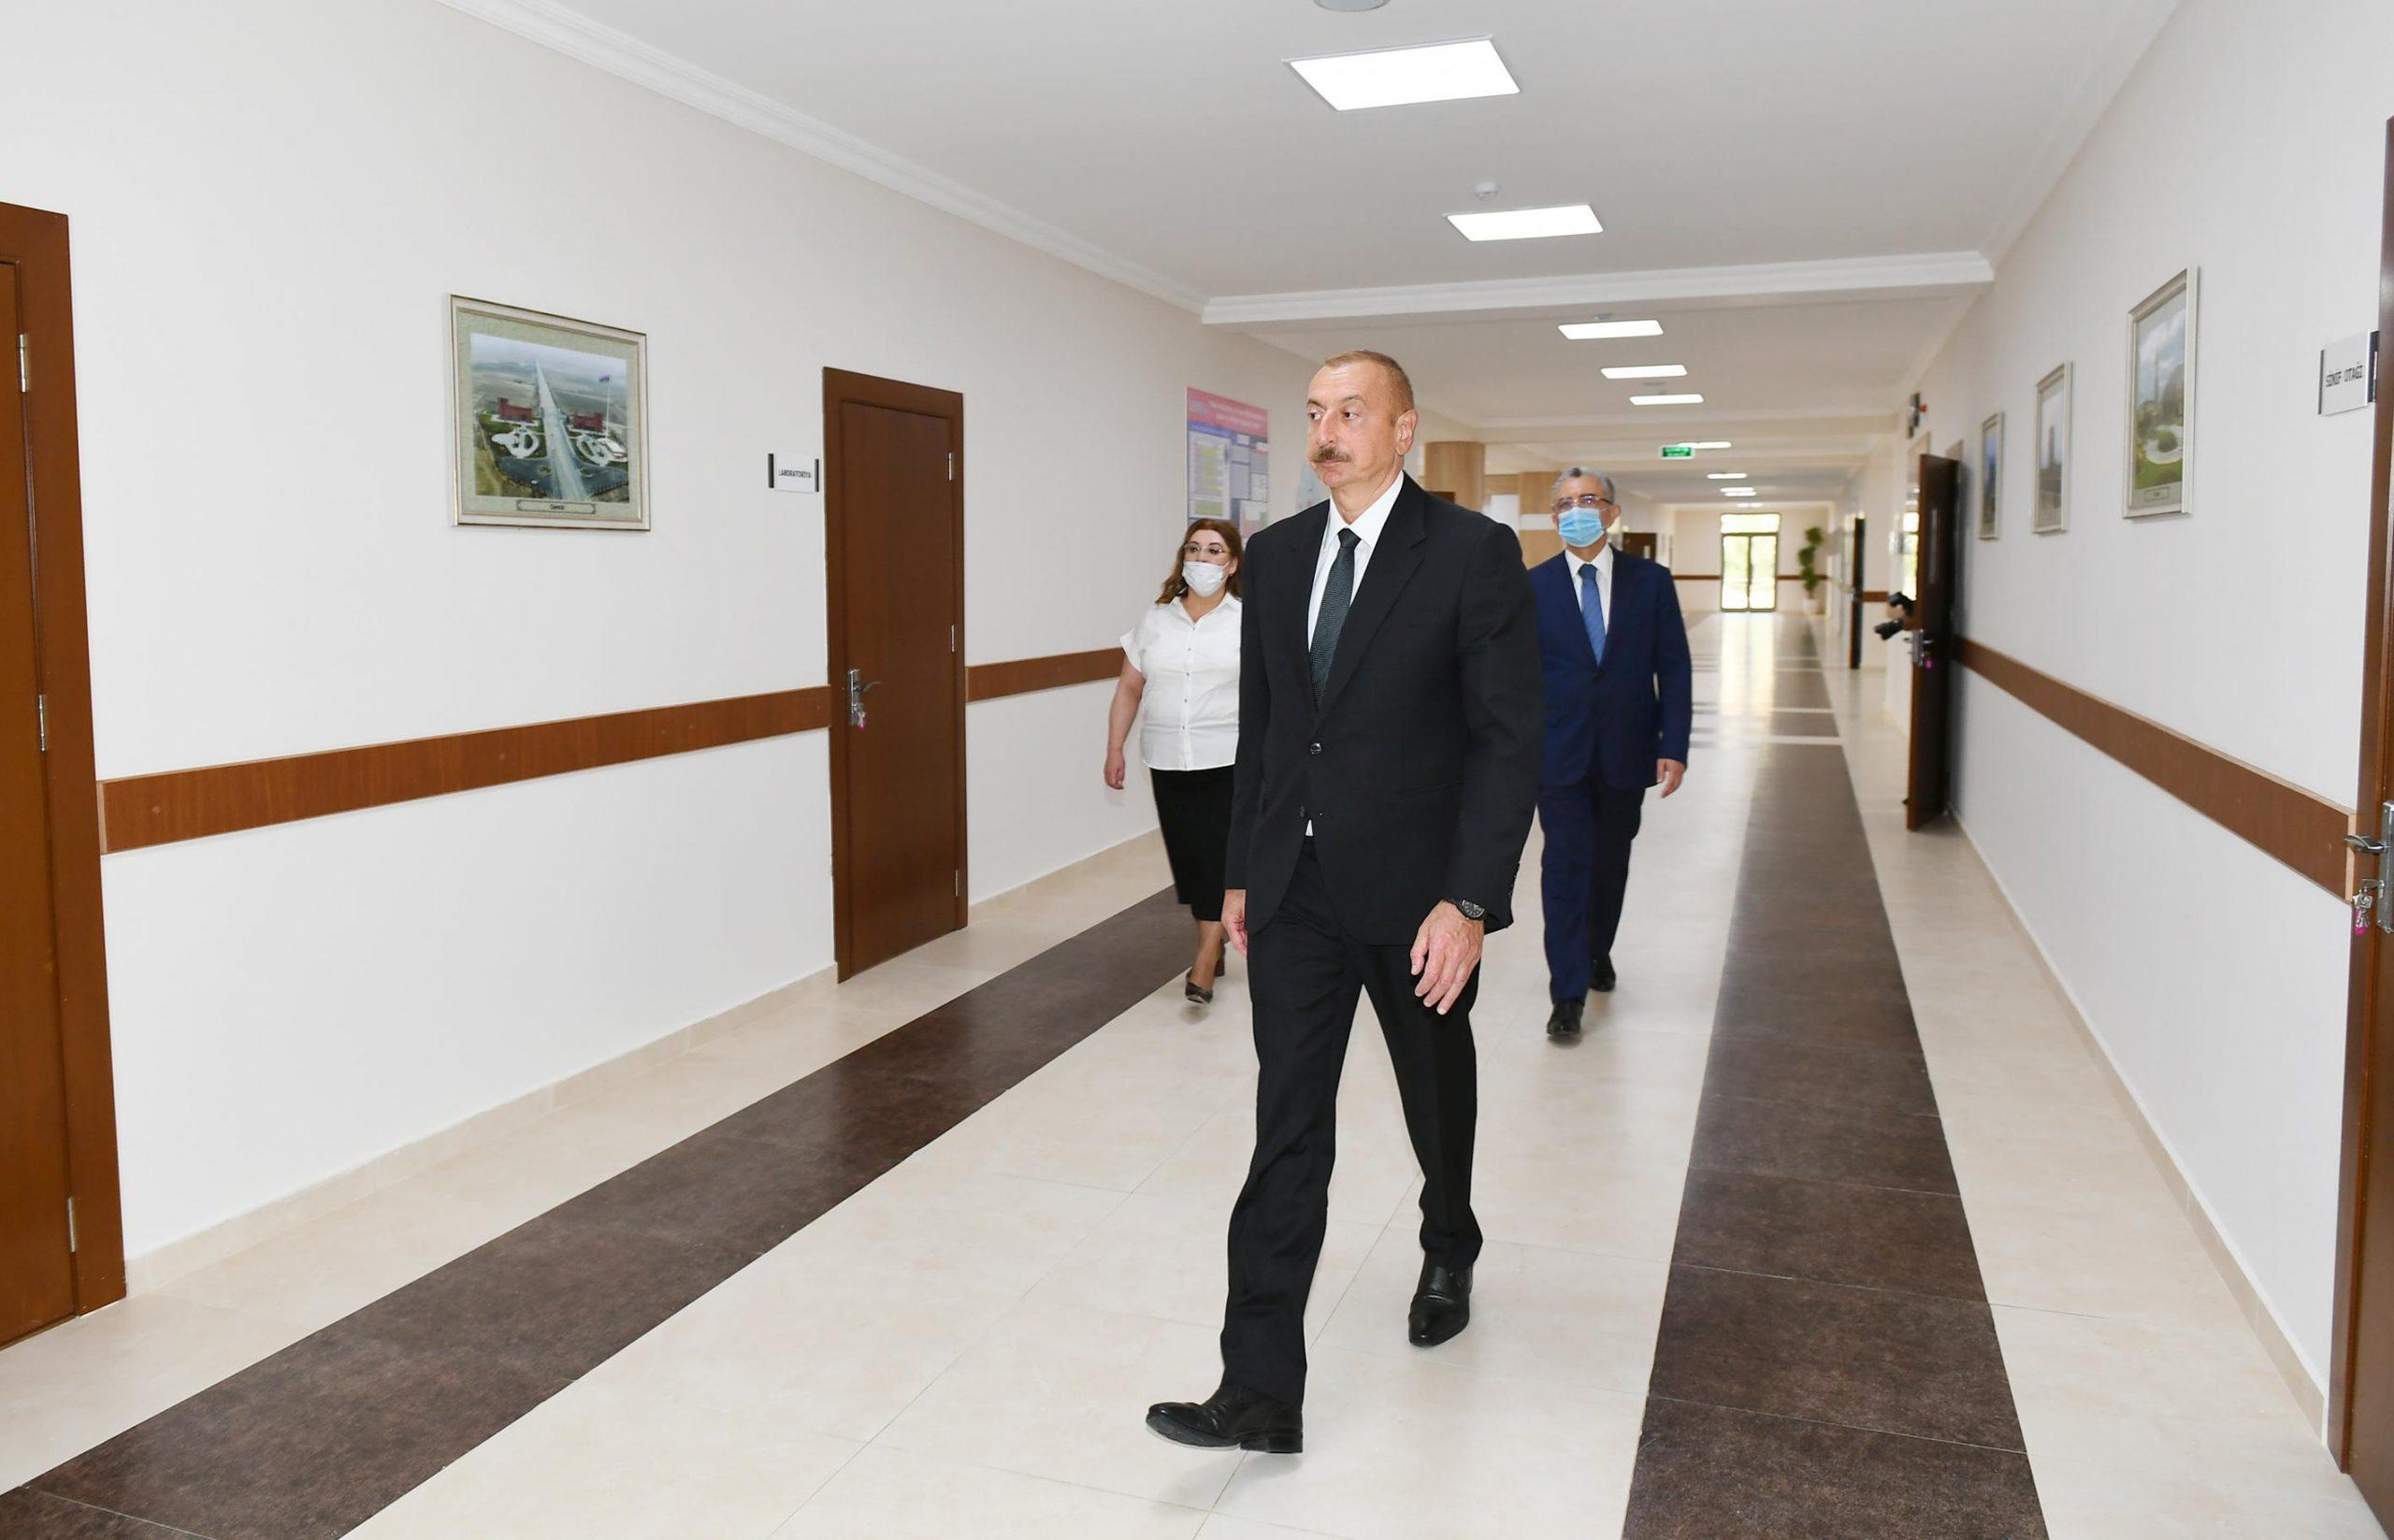 lham Əliyev8 scaled